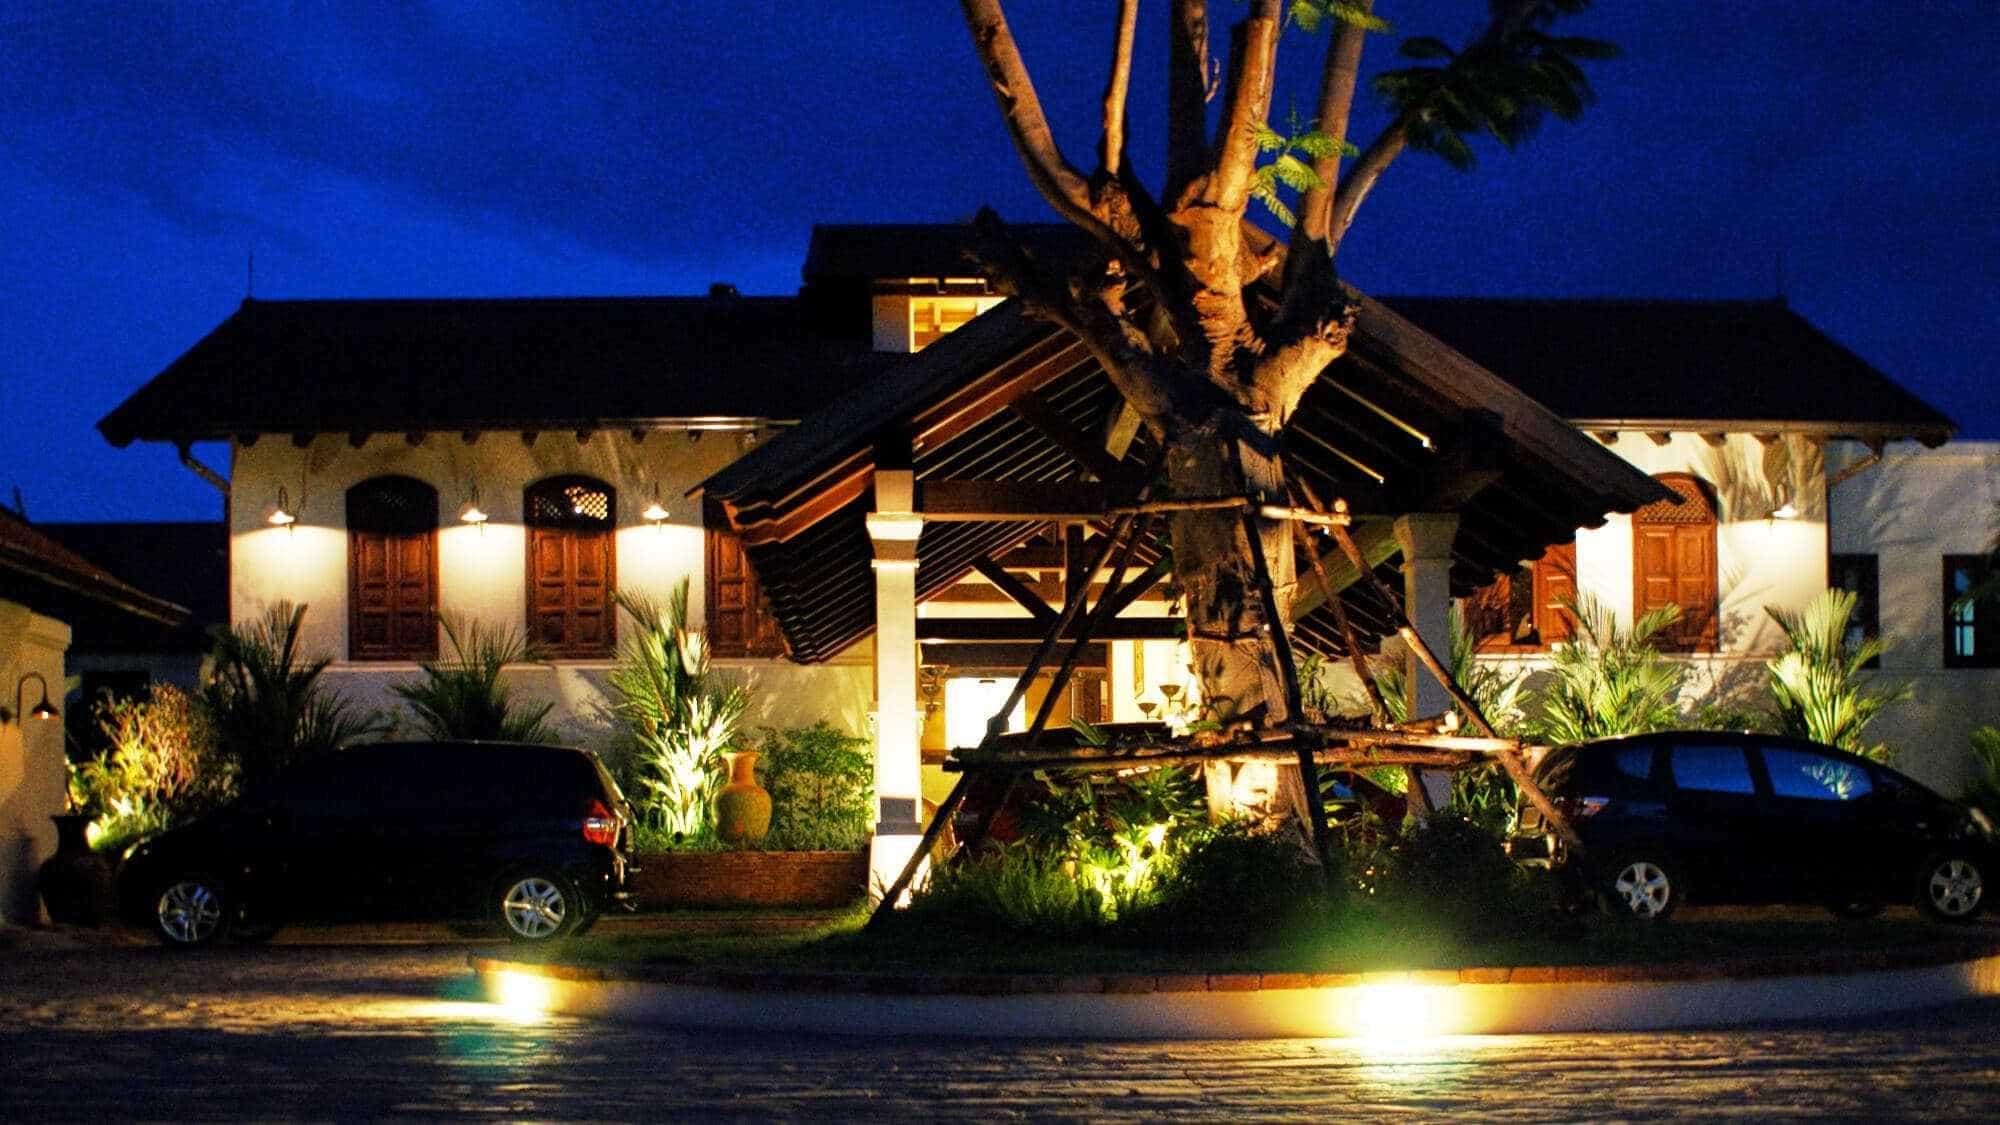 Phuket Villa, nightime lighting